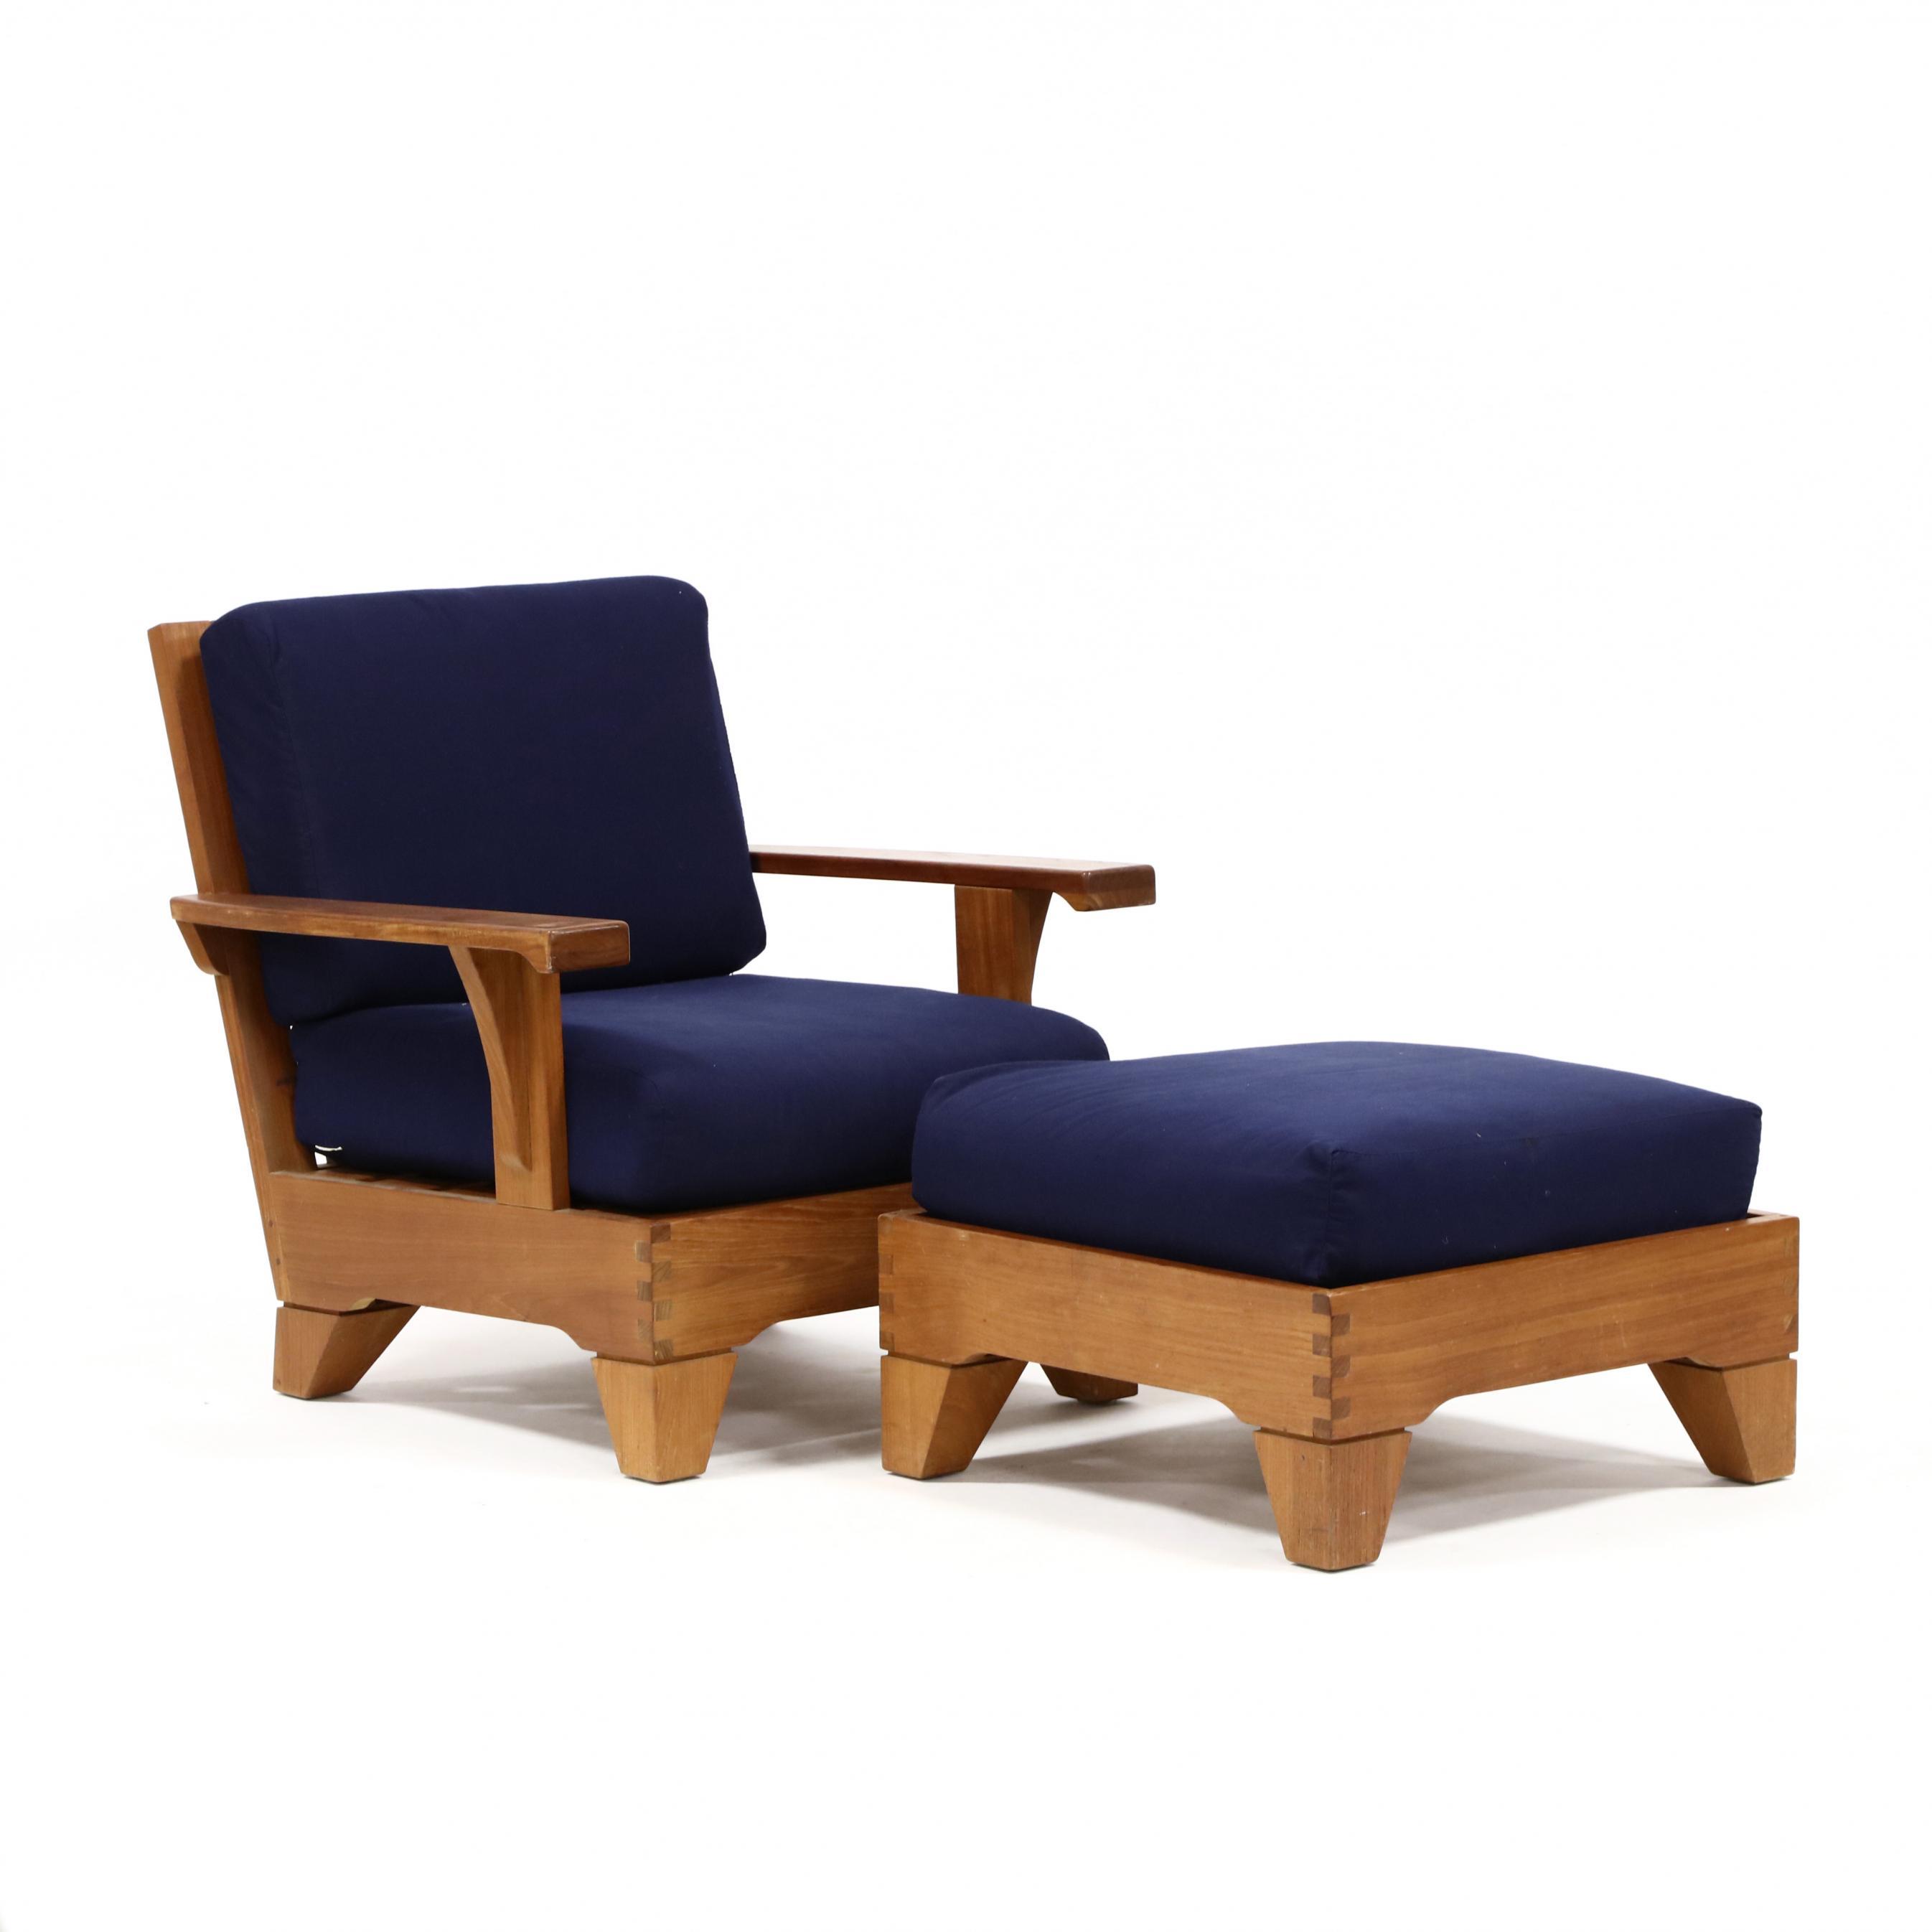 smith-hawkins-teak-chair-and-ottoman